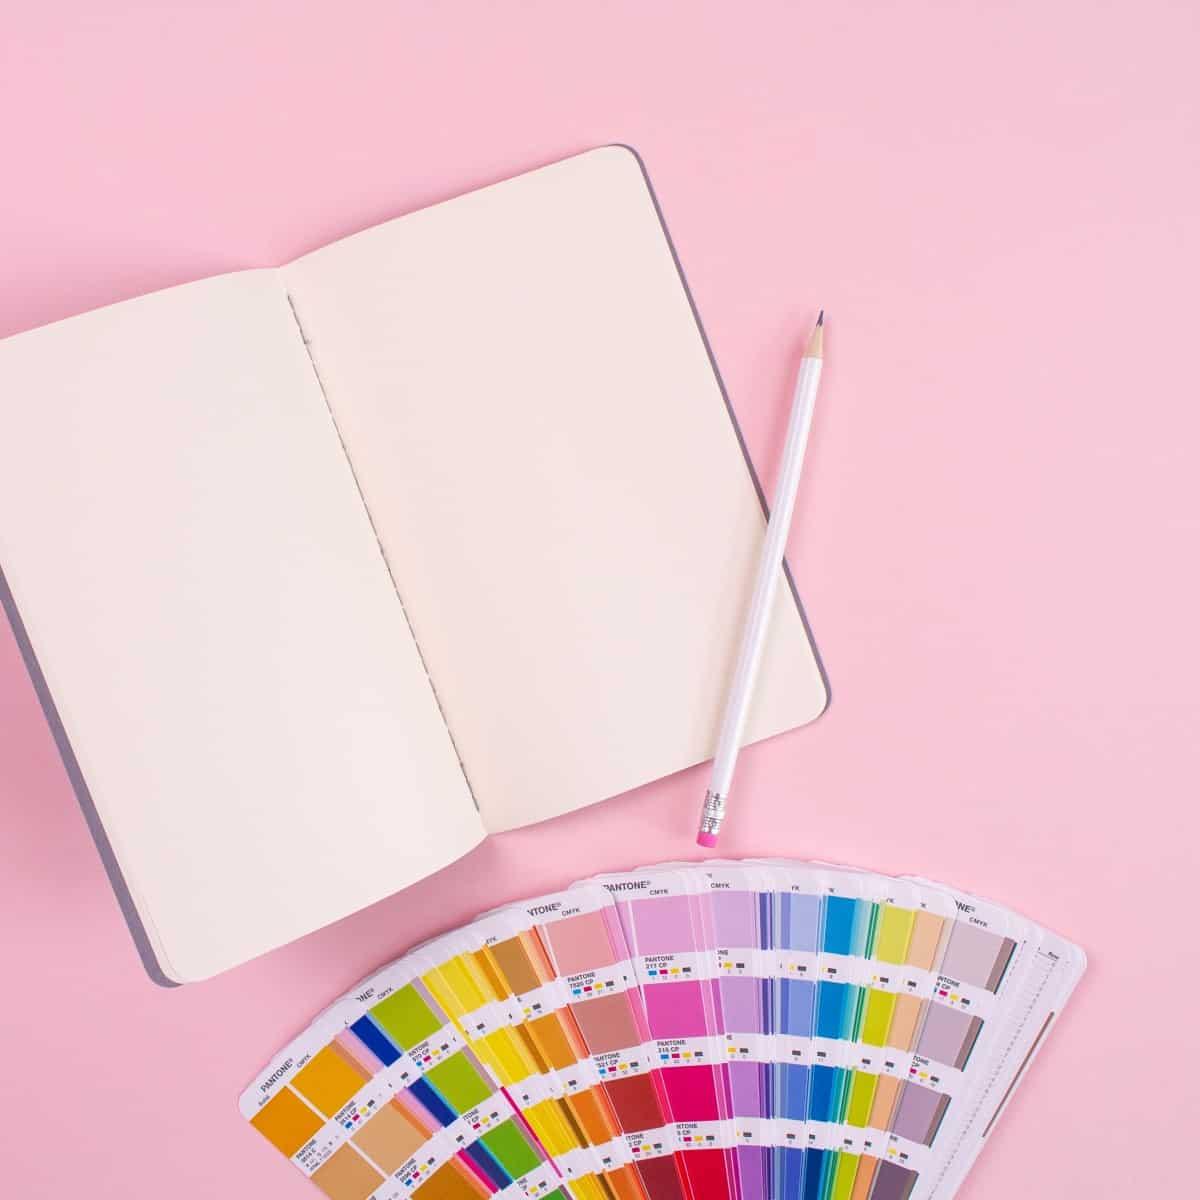 Die Pantone-Trendfarben 2020: Wir wissen heute schon, was morgen in ist